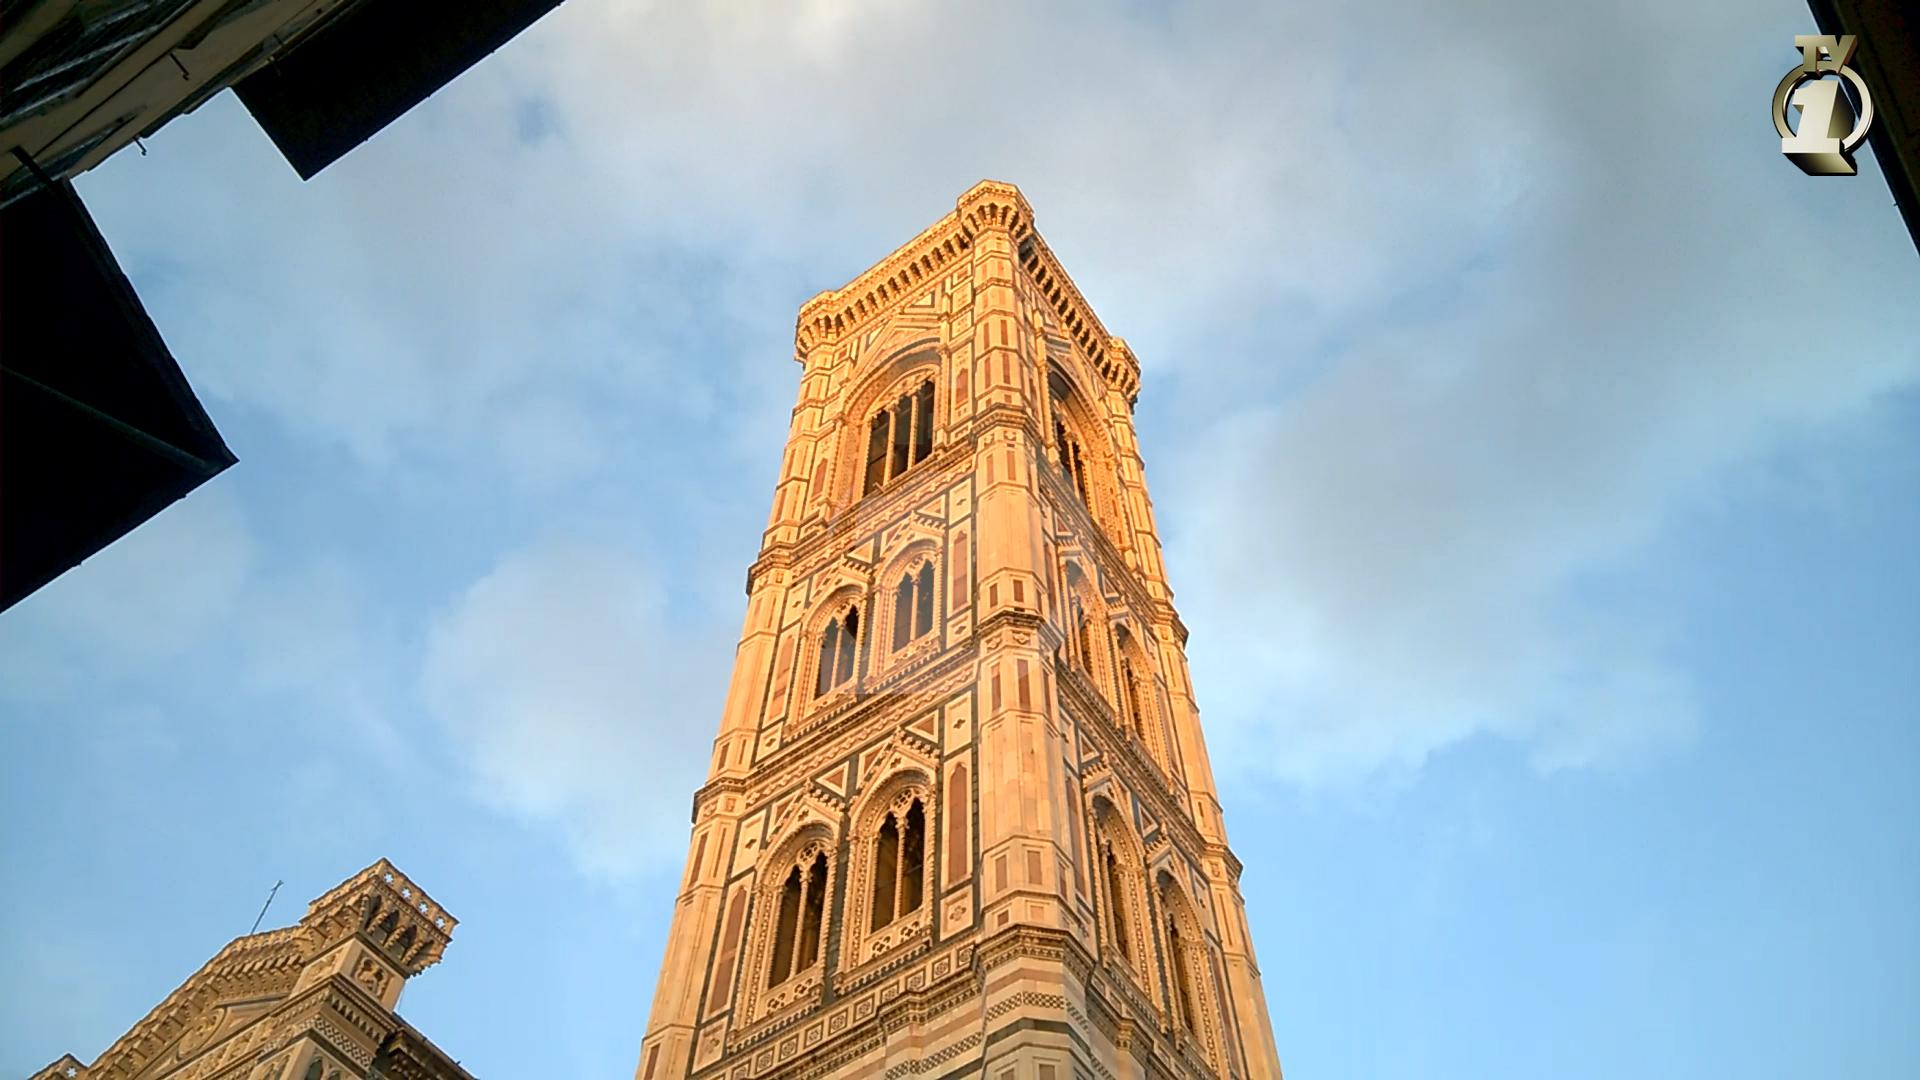 Firenze quarta città in Italia per le denunce